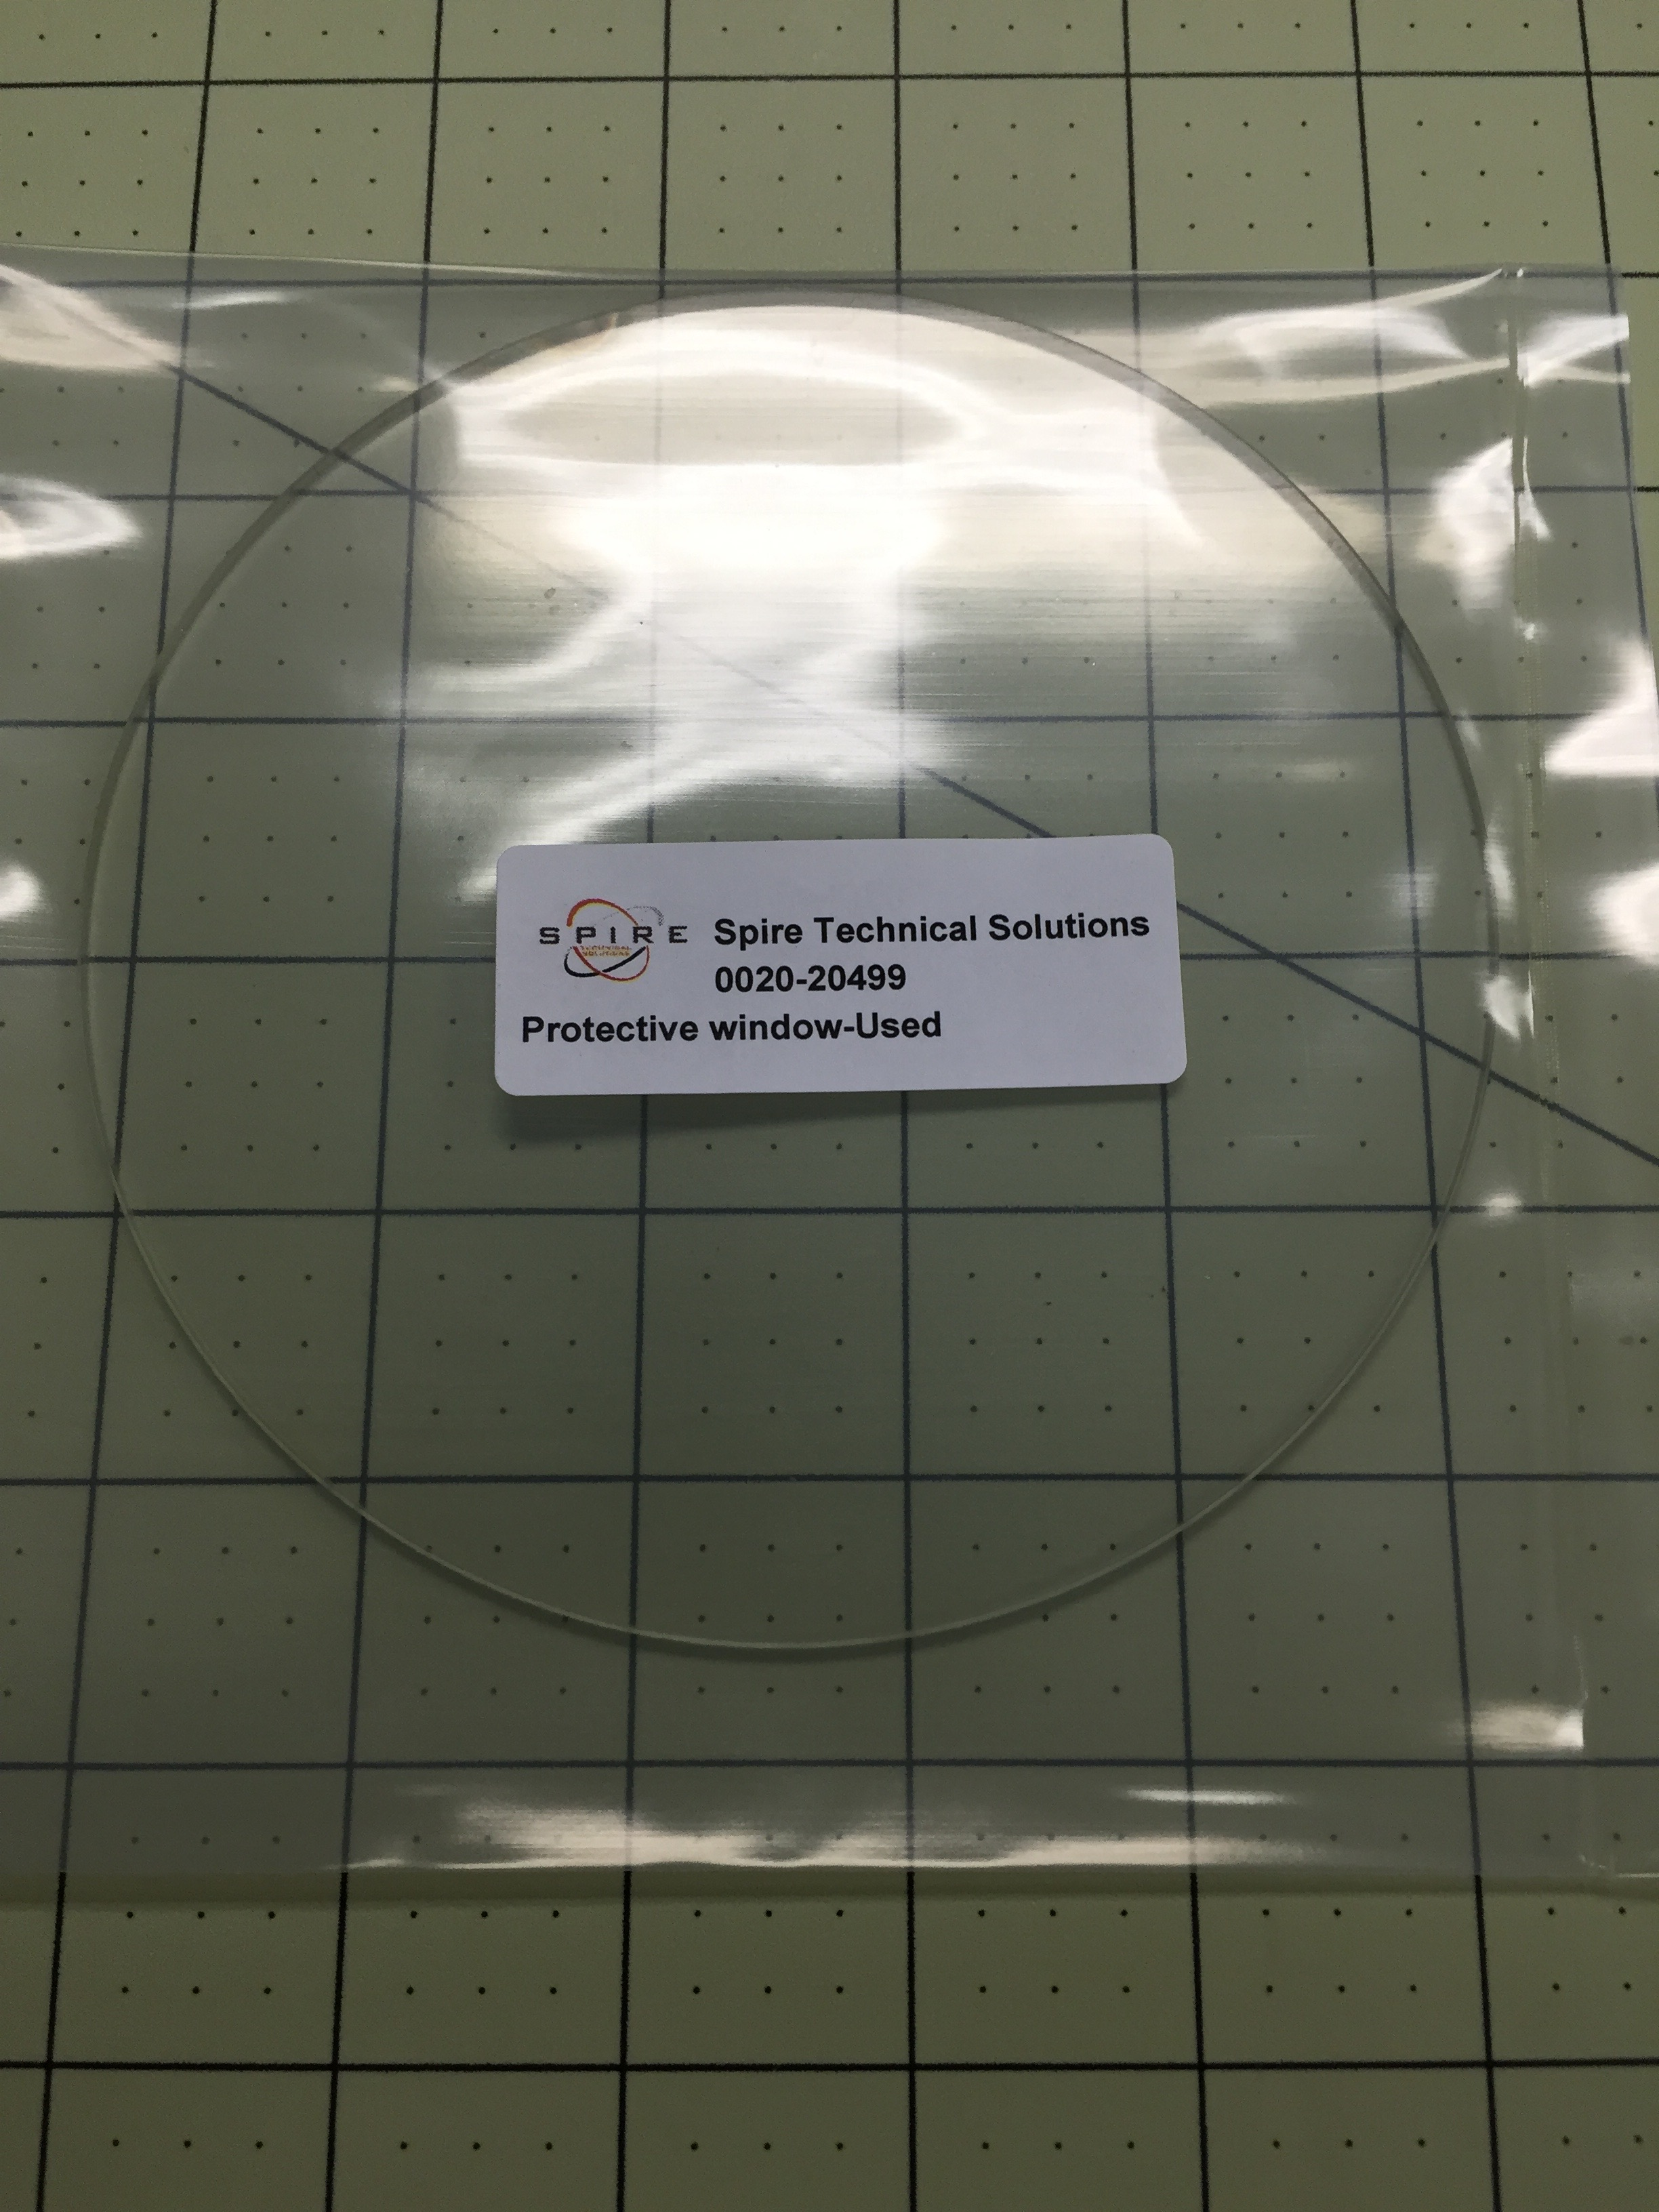 Protective window